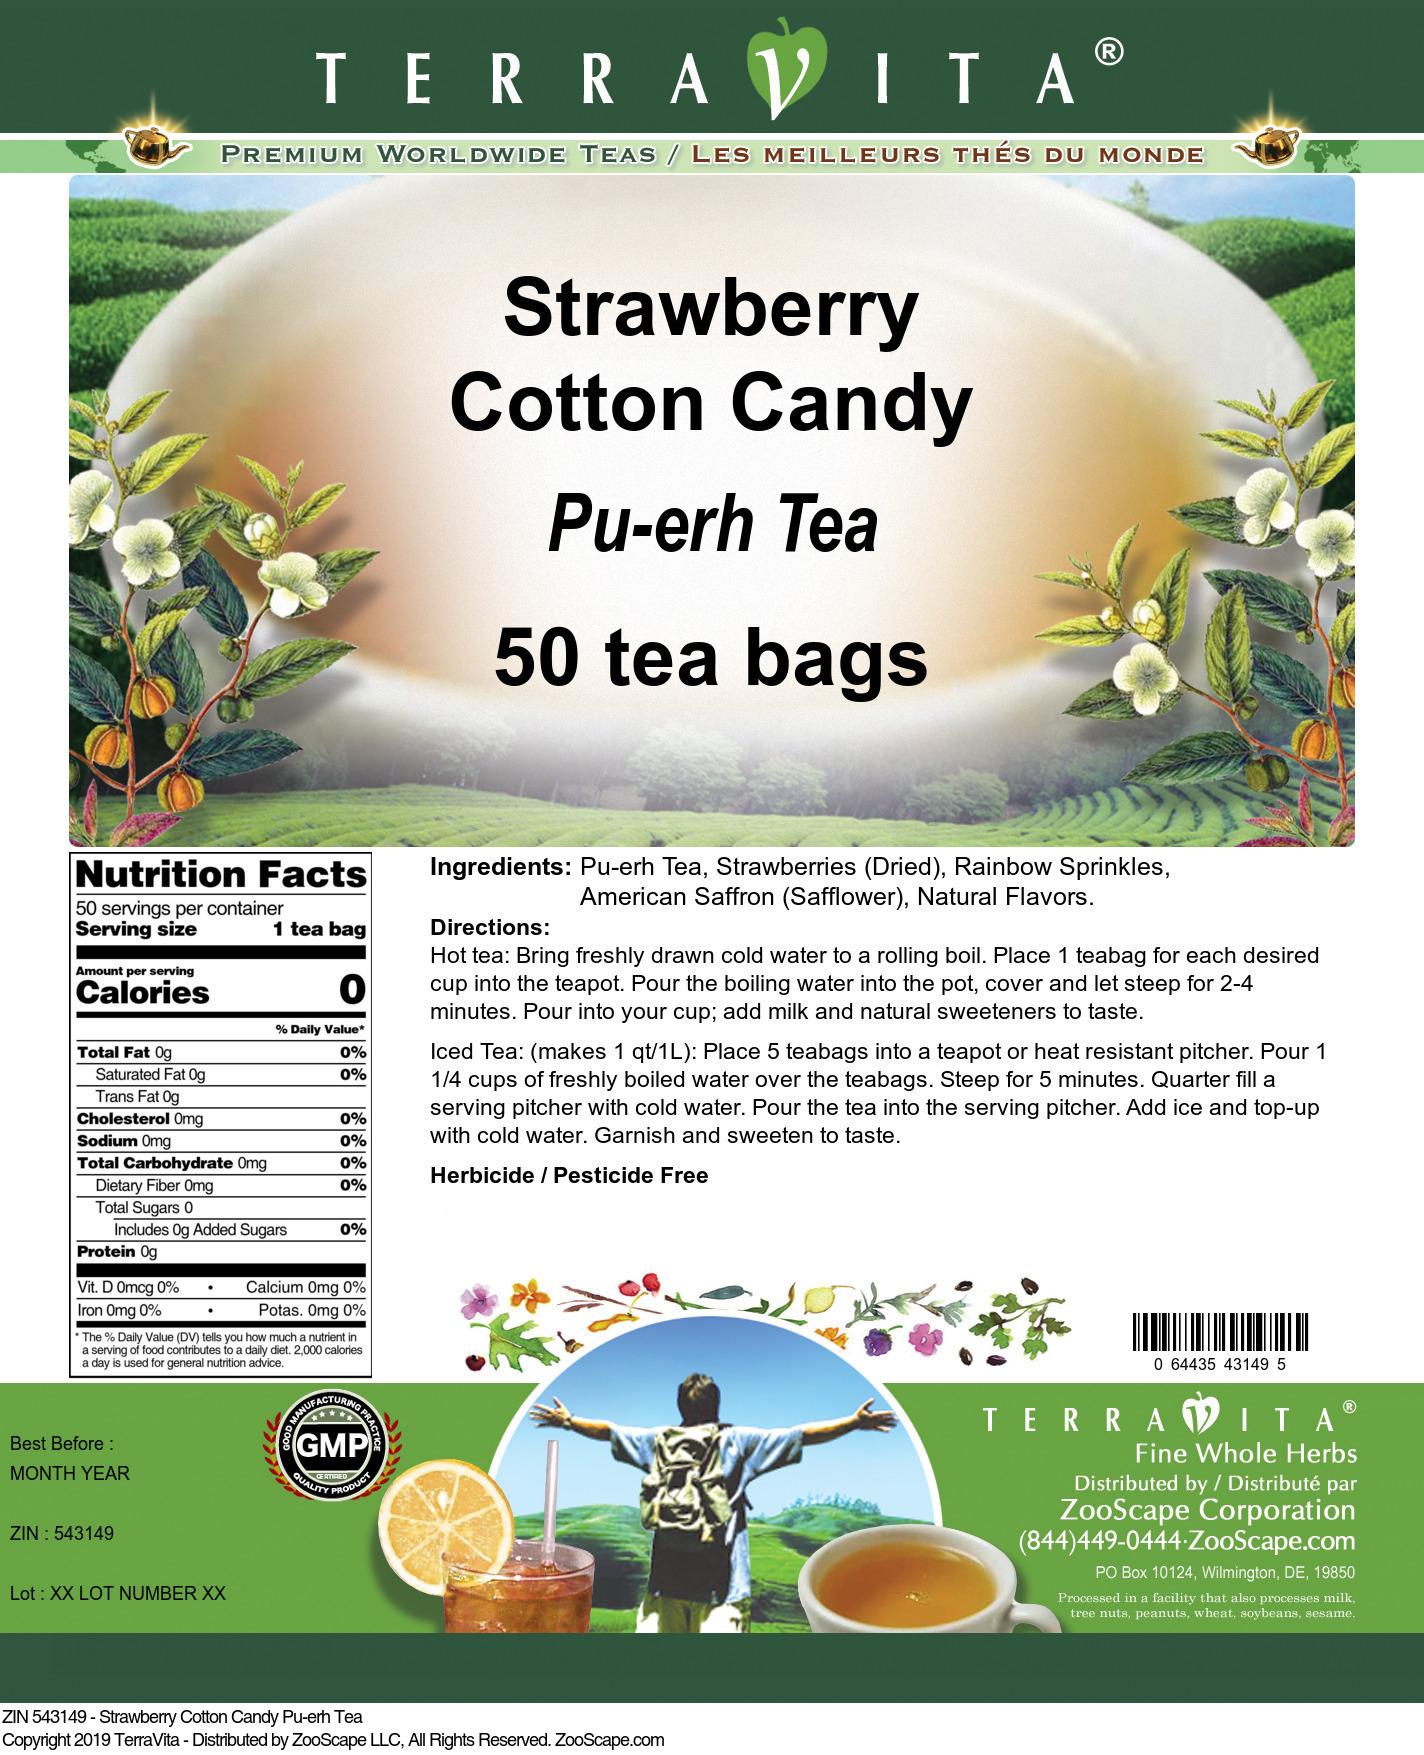 Strawberry Cotton Candy Pu-erh Tea